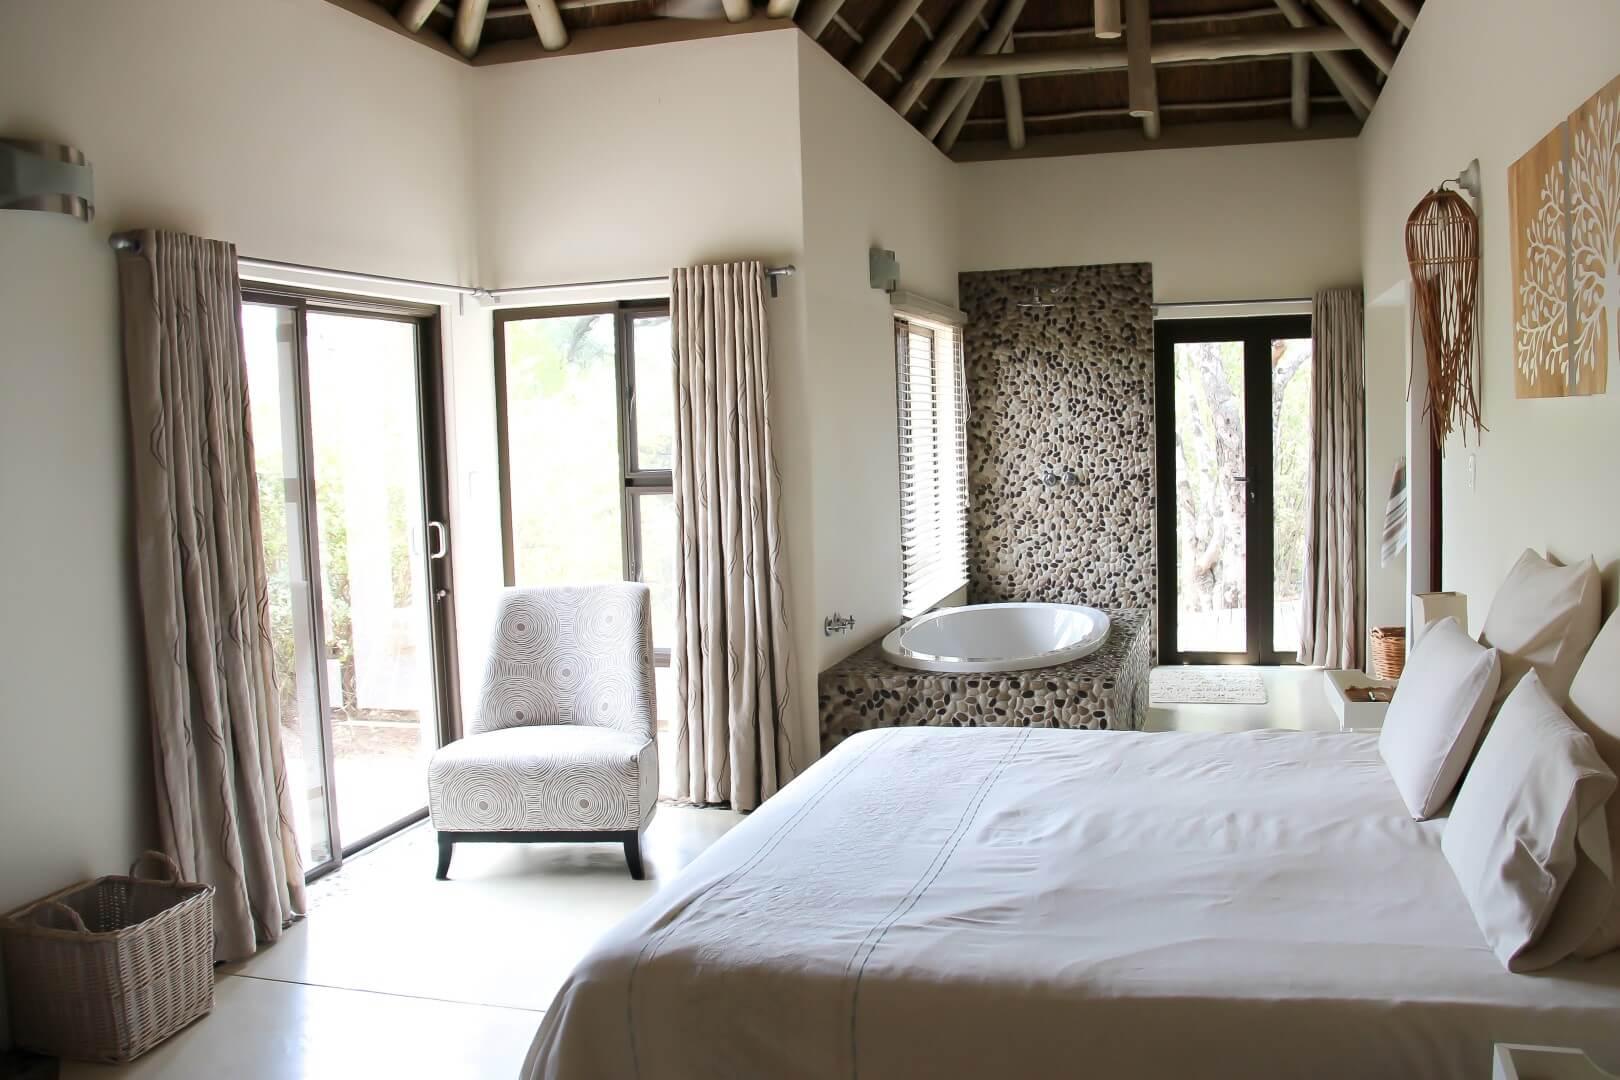 Accommodation Hoedspruit - South Africa